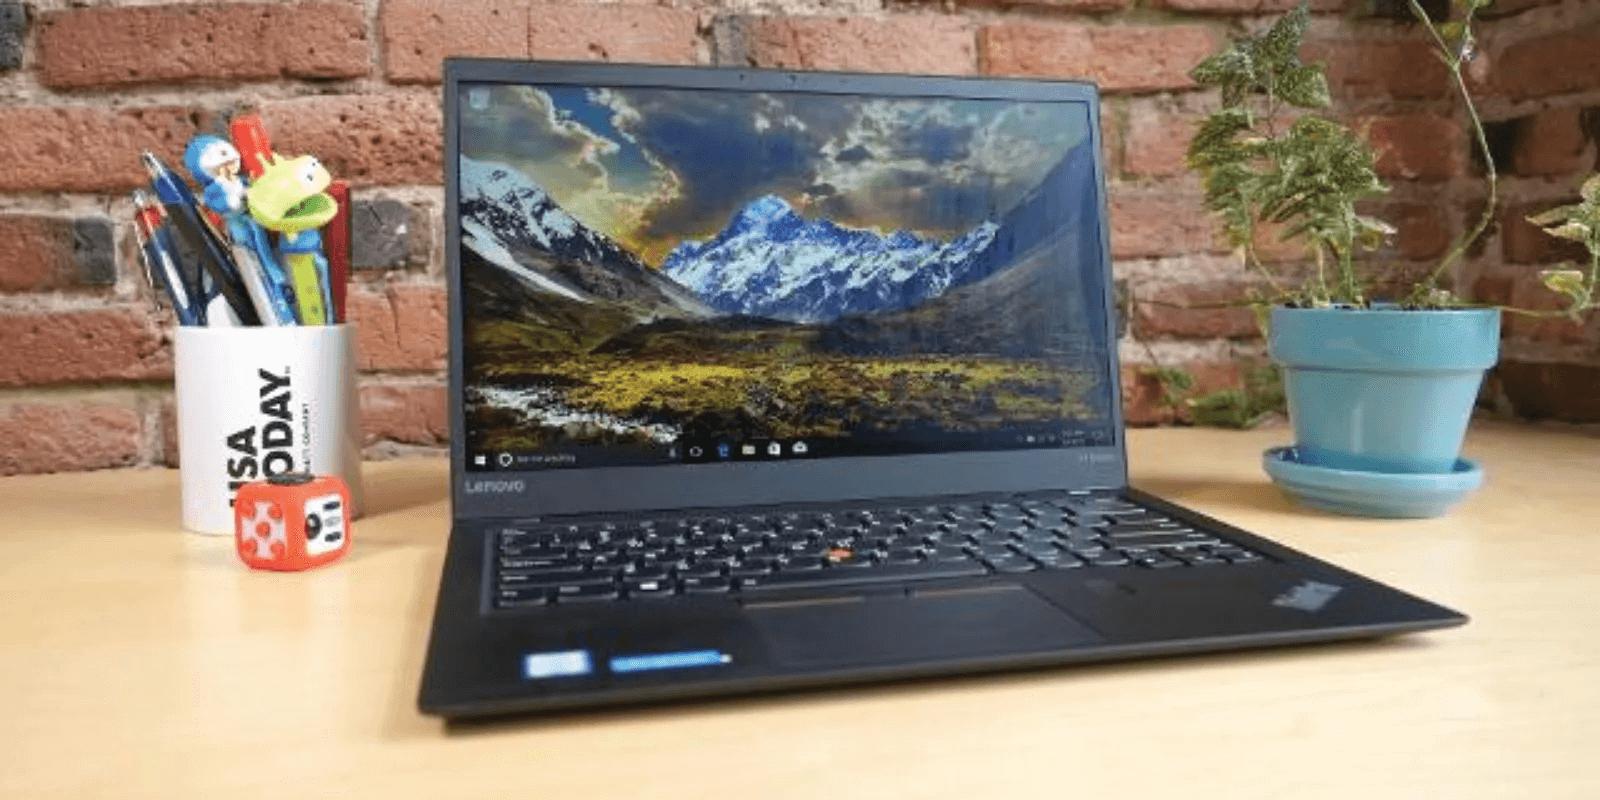 lenovo-laptop-service-bangalore